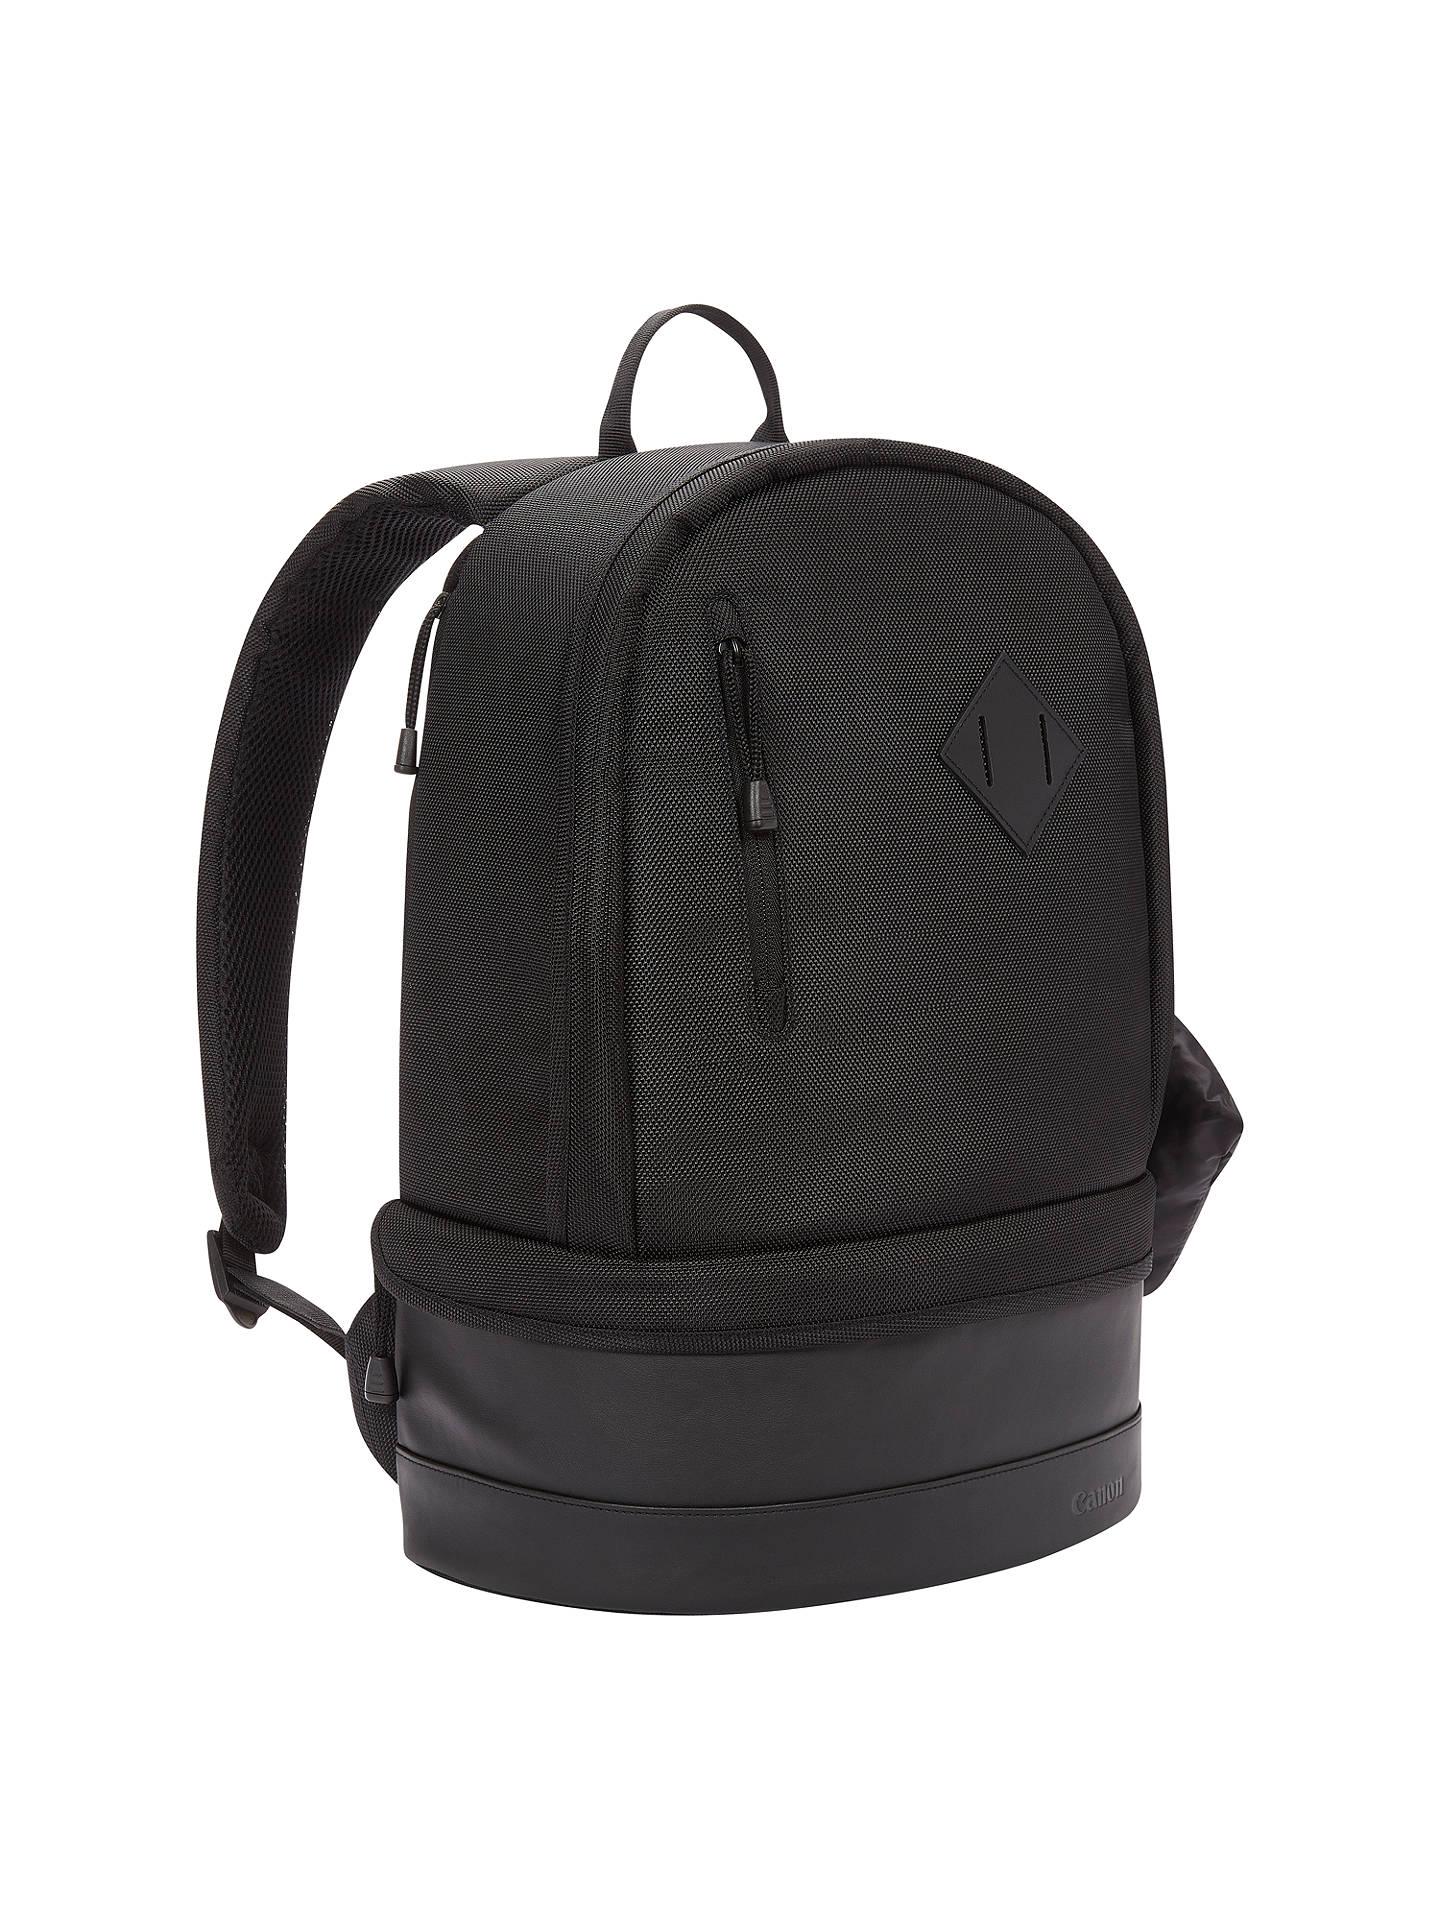 e5d185e13755 BuyCanon BP100 Camera Case Backpack Online at johnlewis.com ...